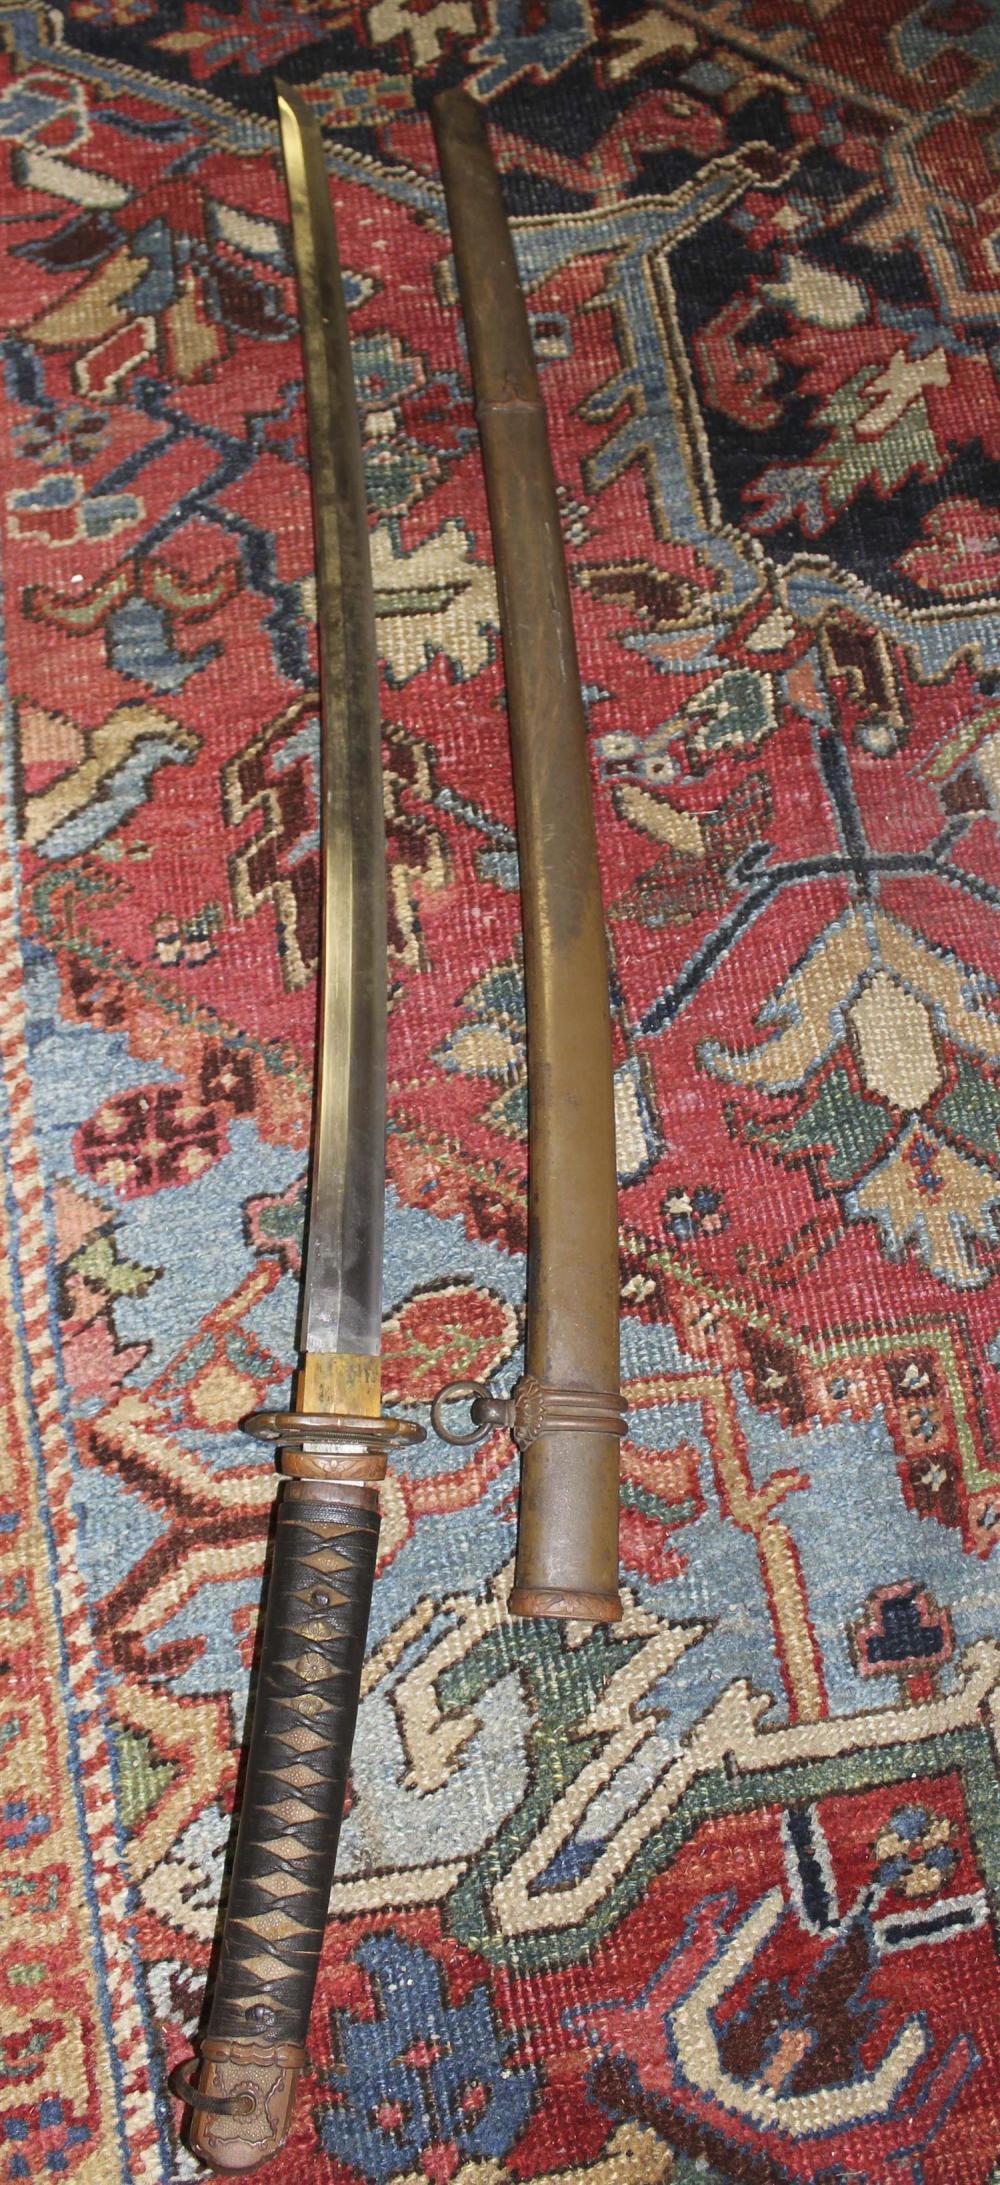 JAPANESE KATANA GUNTO OFFICER'S SWORD Tang signed. Sharkskin wrap. Includes tsuba and metal scabbard. Missing foot. Blade length 28...